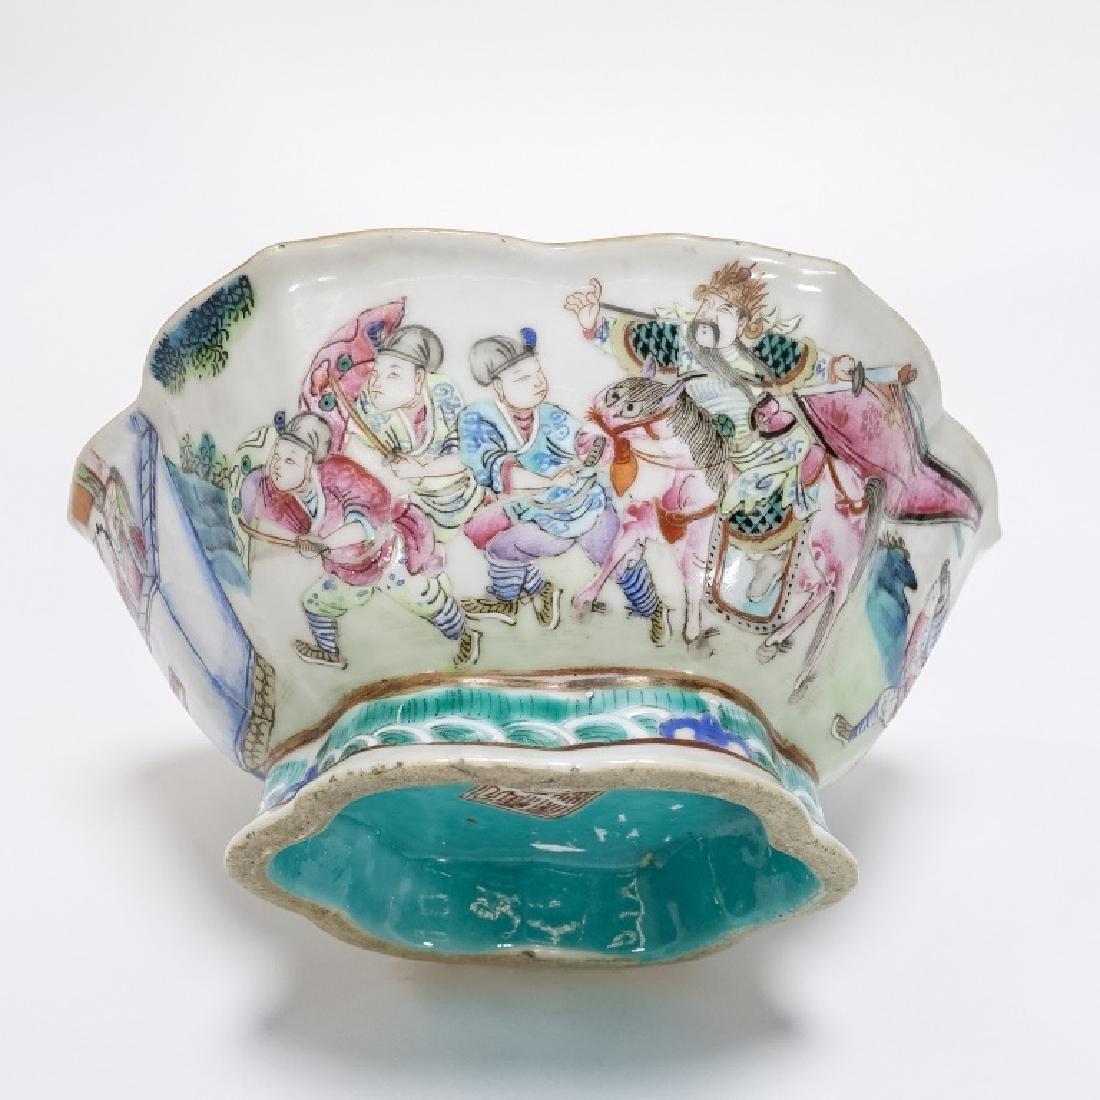 2 Chinese Porcelain Famille Rose Signed Bowls - 4